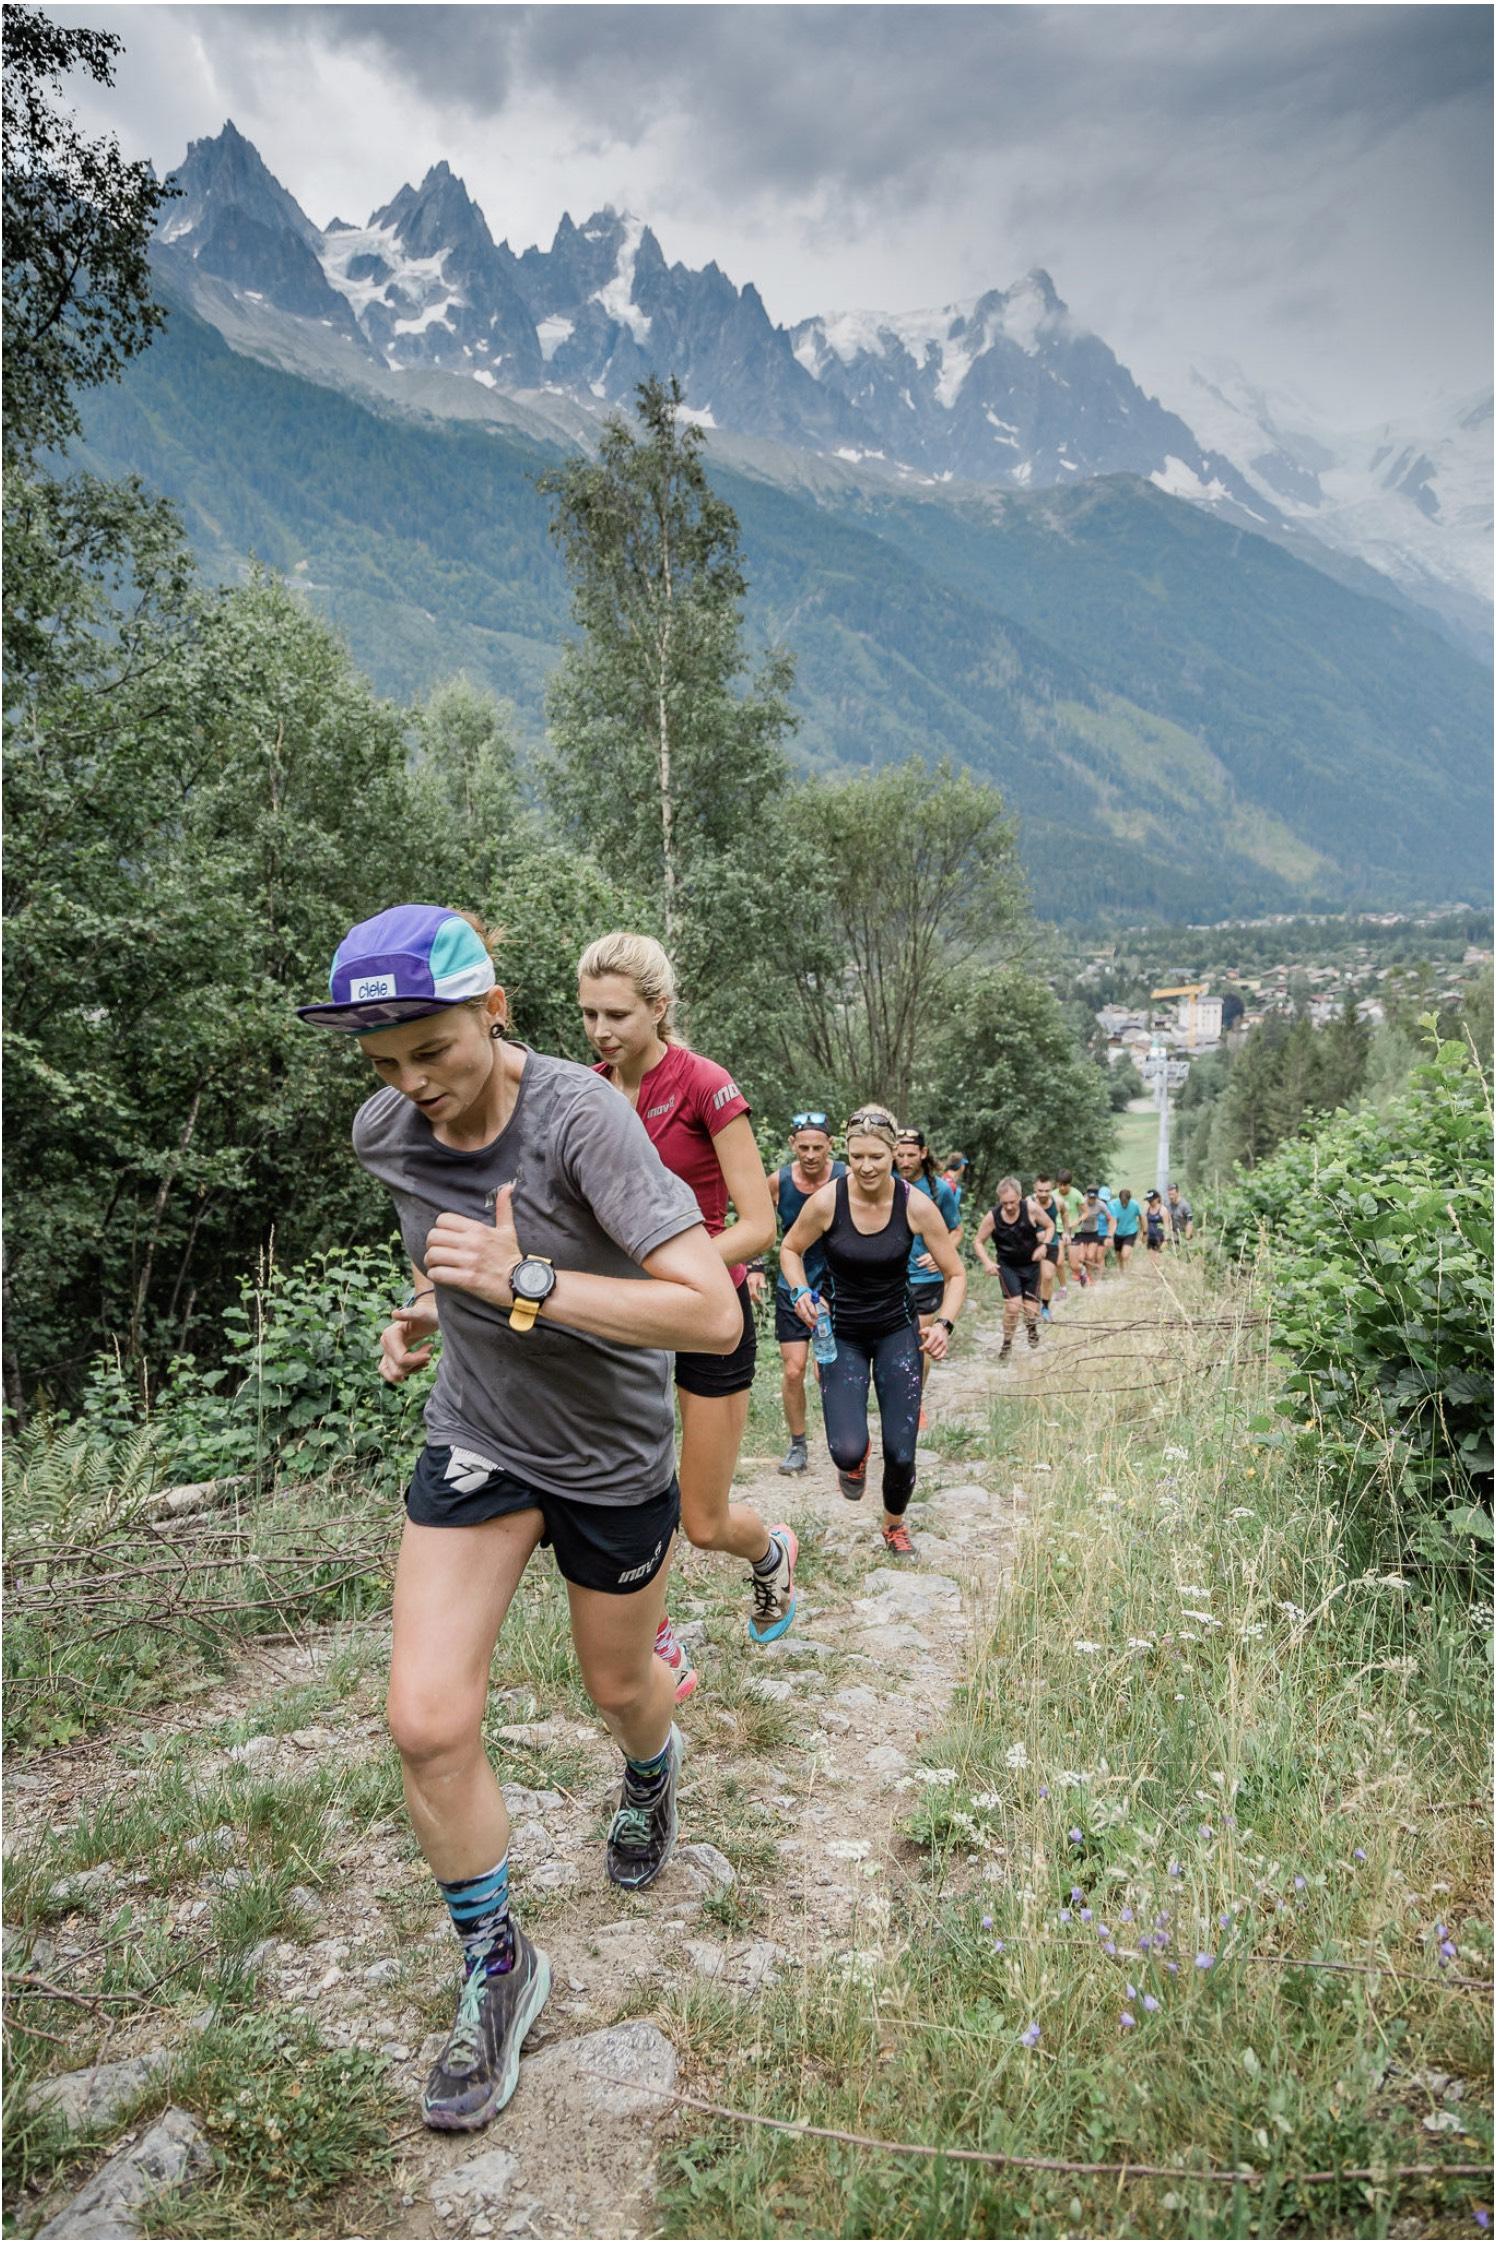 JaySki running the Chamonix Trails